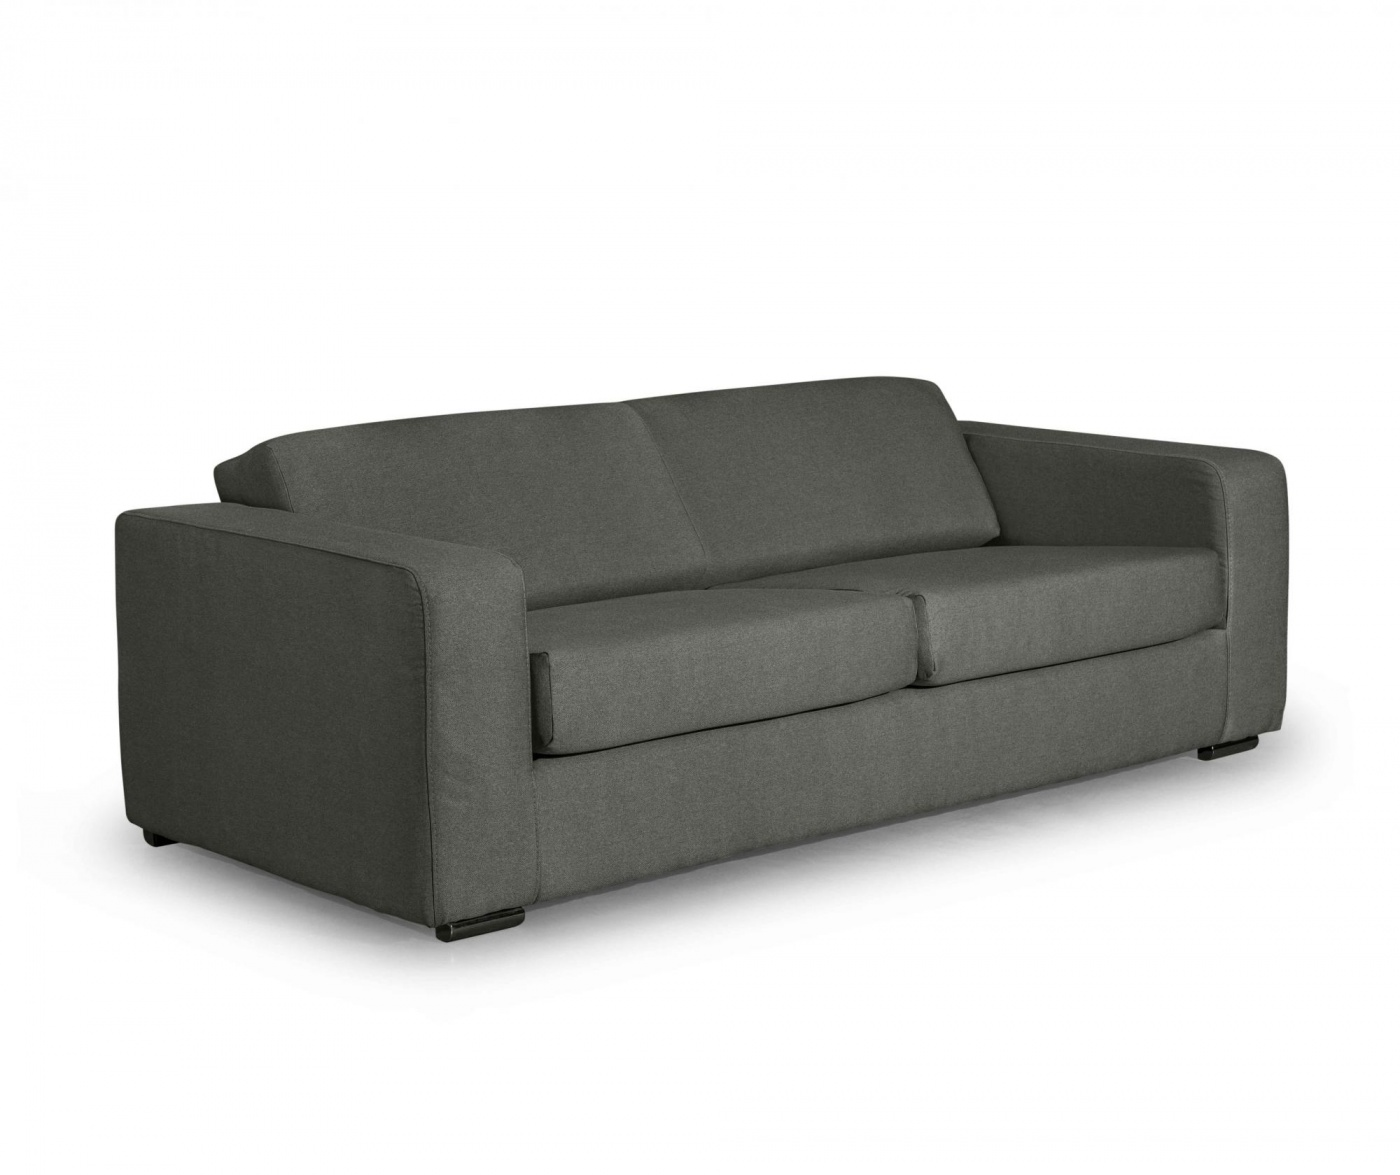 Canapea 3 locuri Ava Bladen Grey